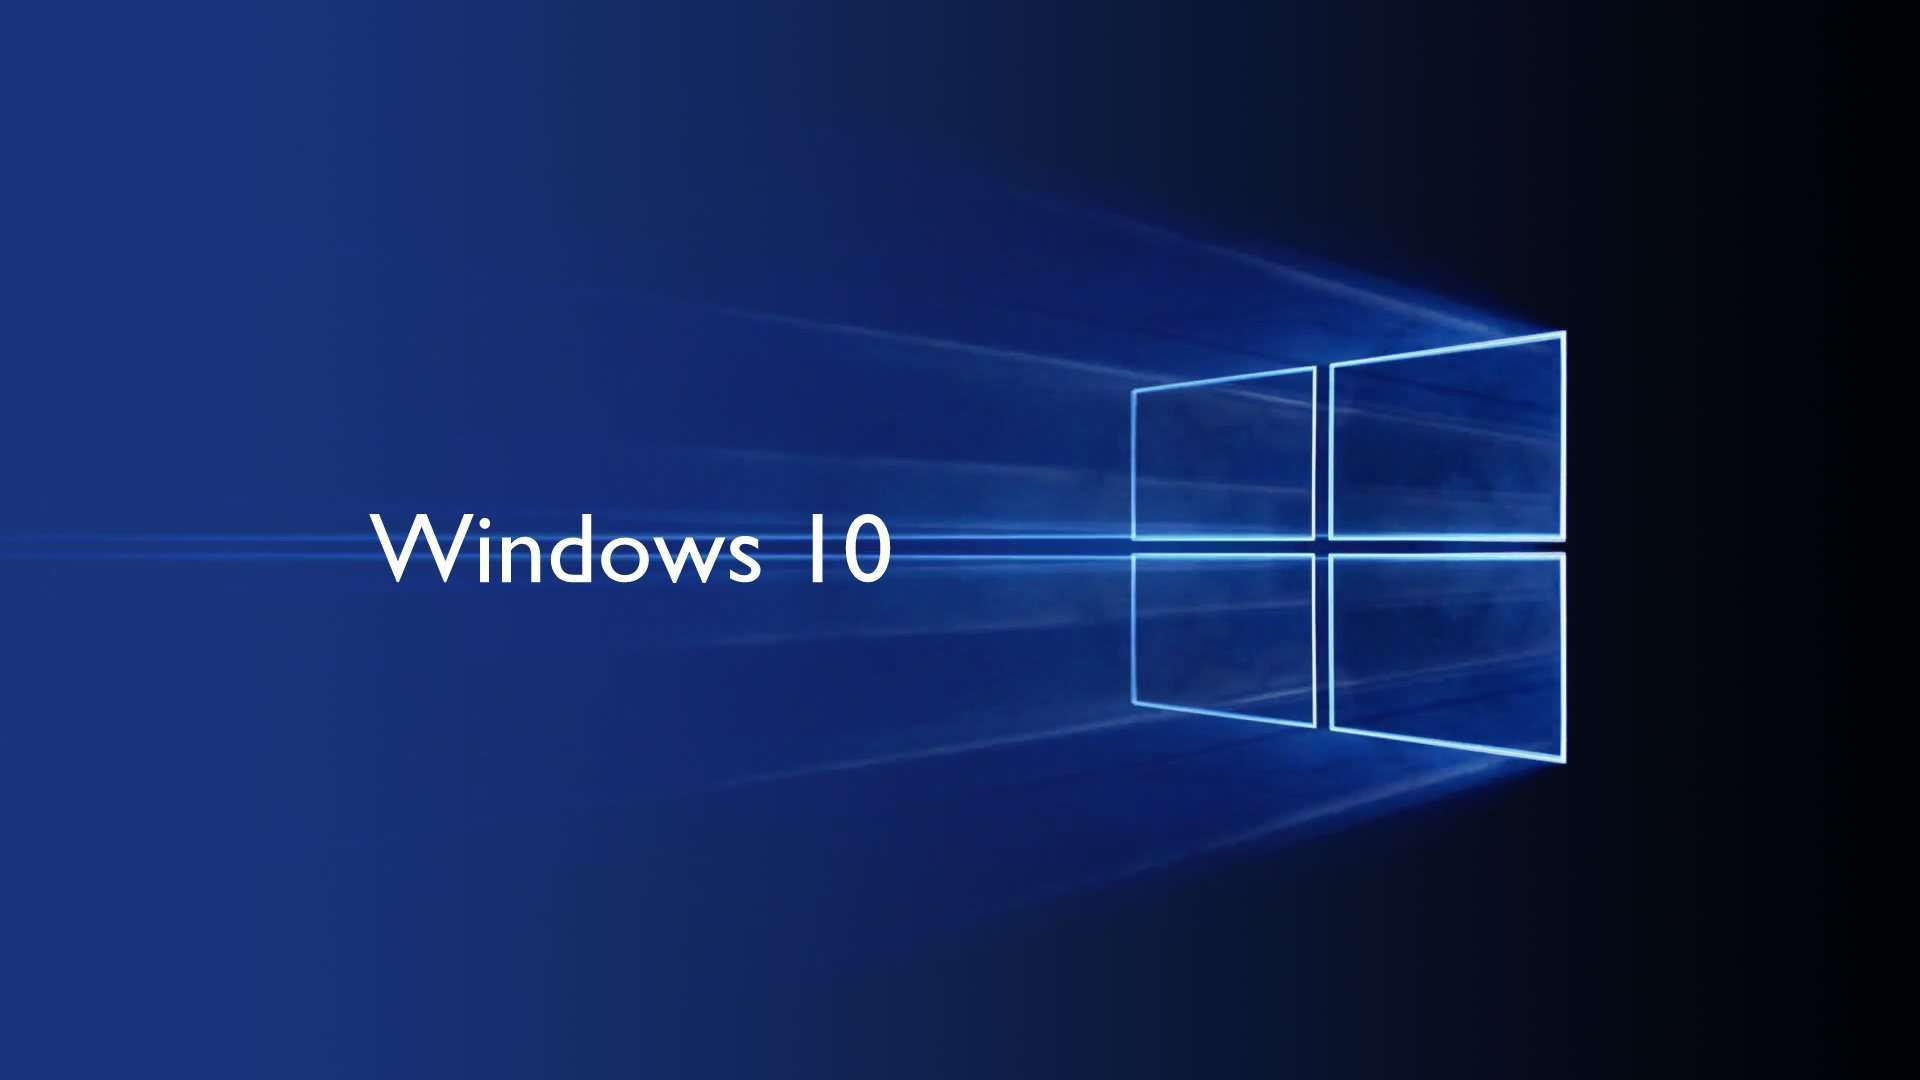 47 Windows 10 1080p Wallpapers On Wallpapersafari